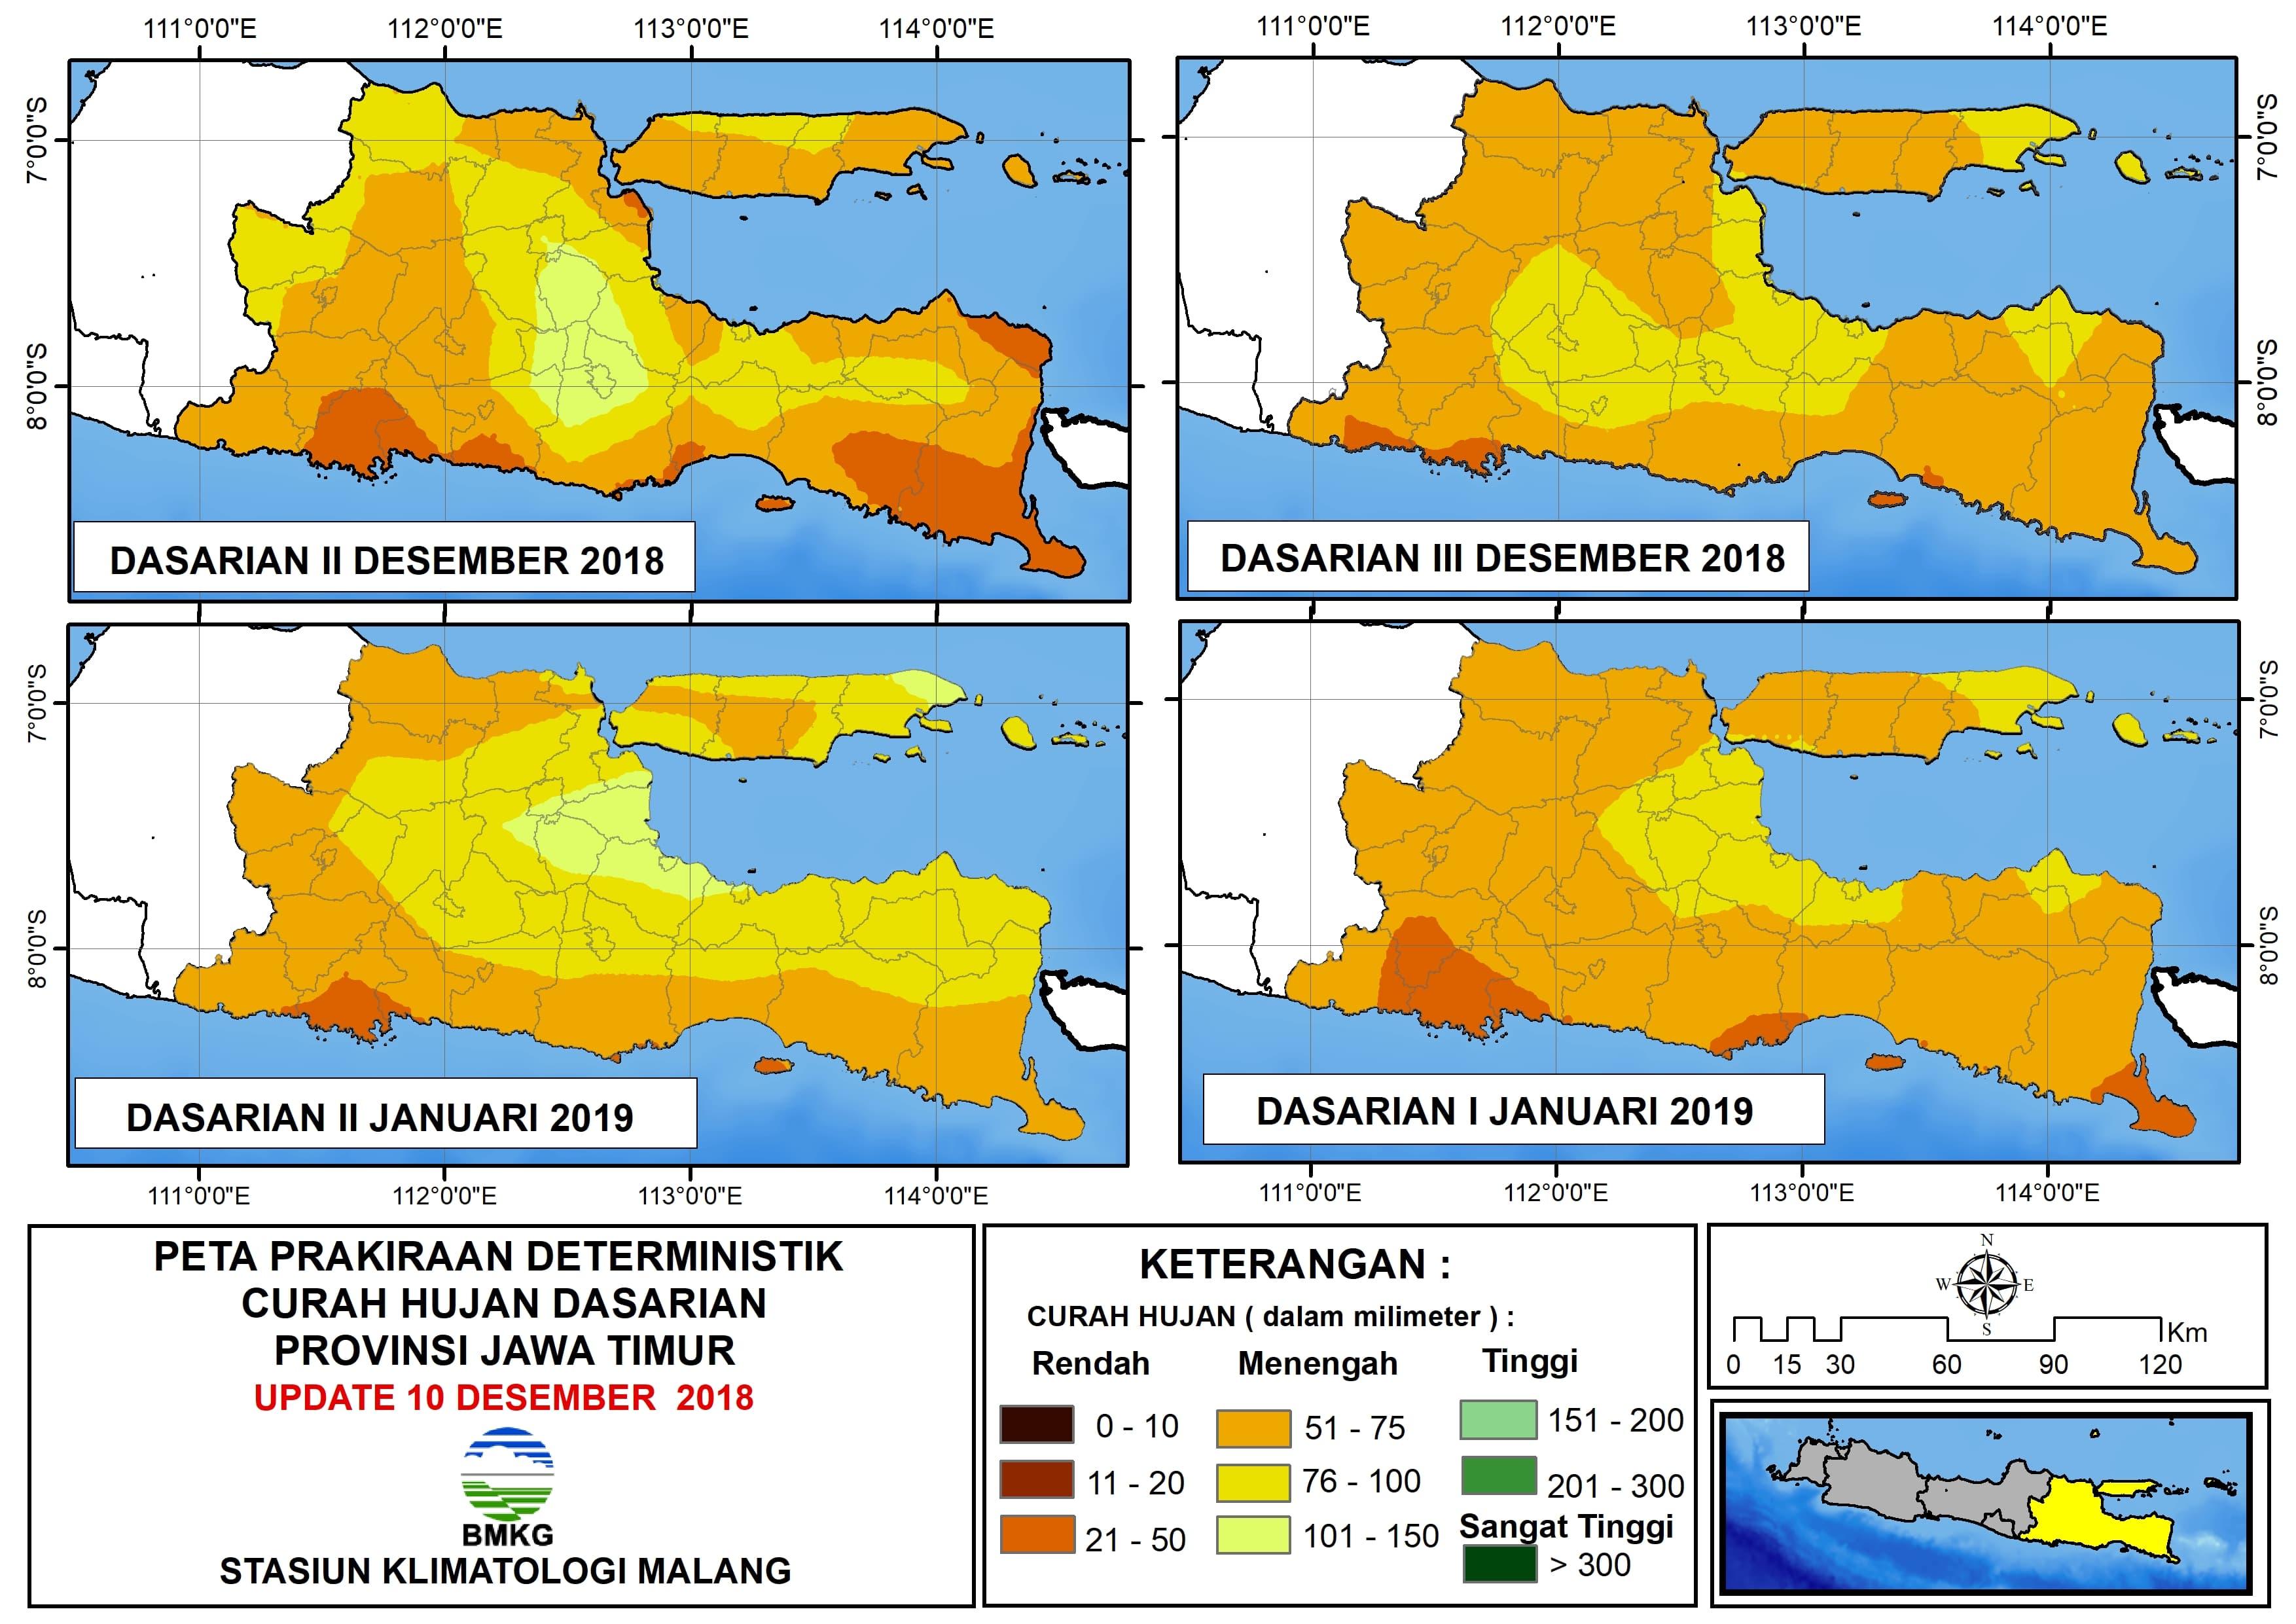 Peta Prakiraan Deterministik Curah Hujan Dasarian Provinsi Jawa Timur Update 10 Desember 2018